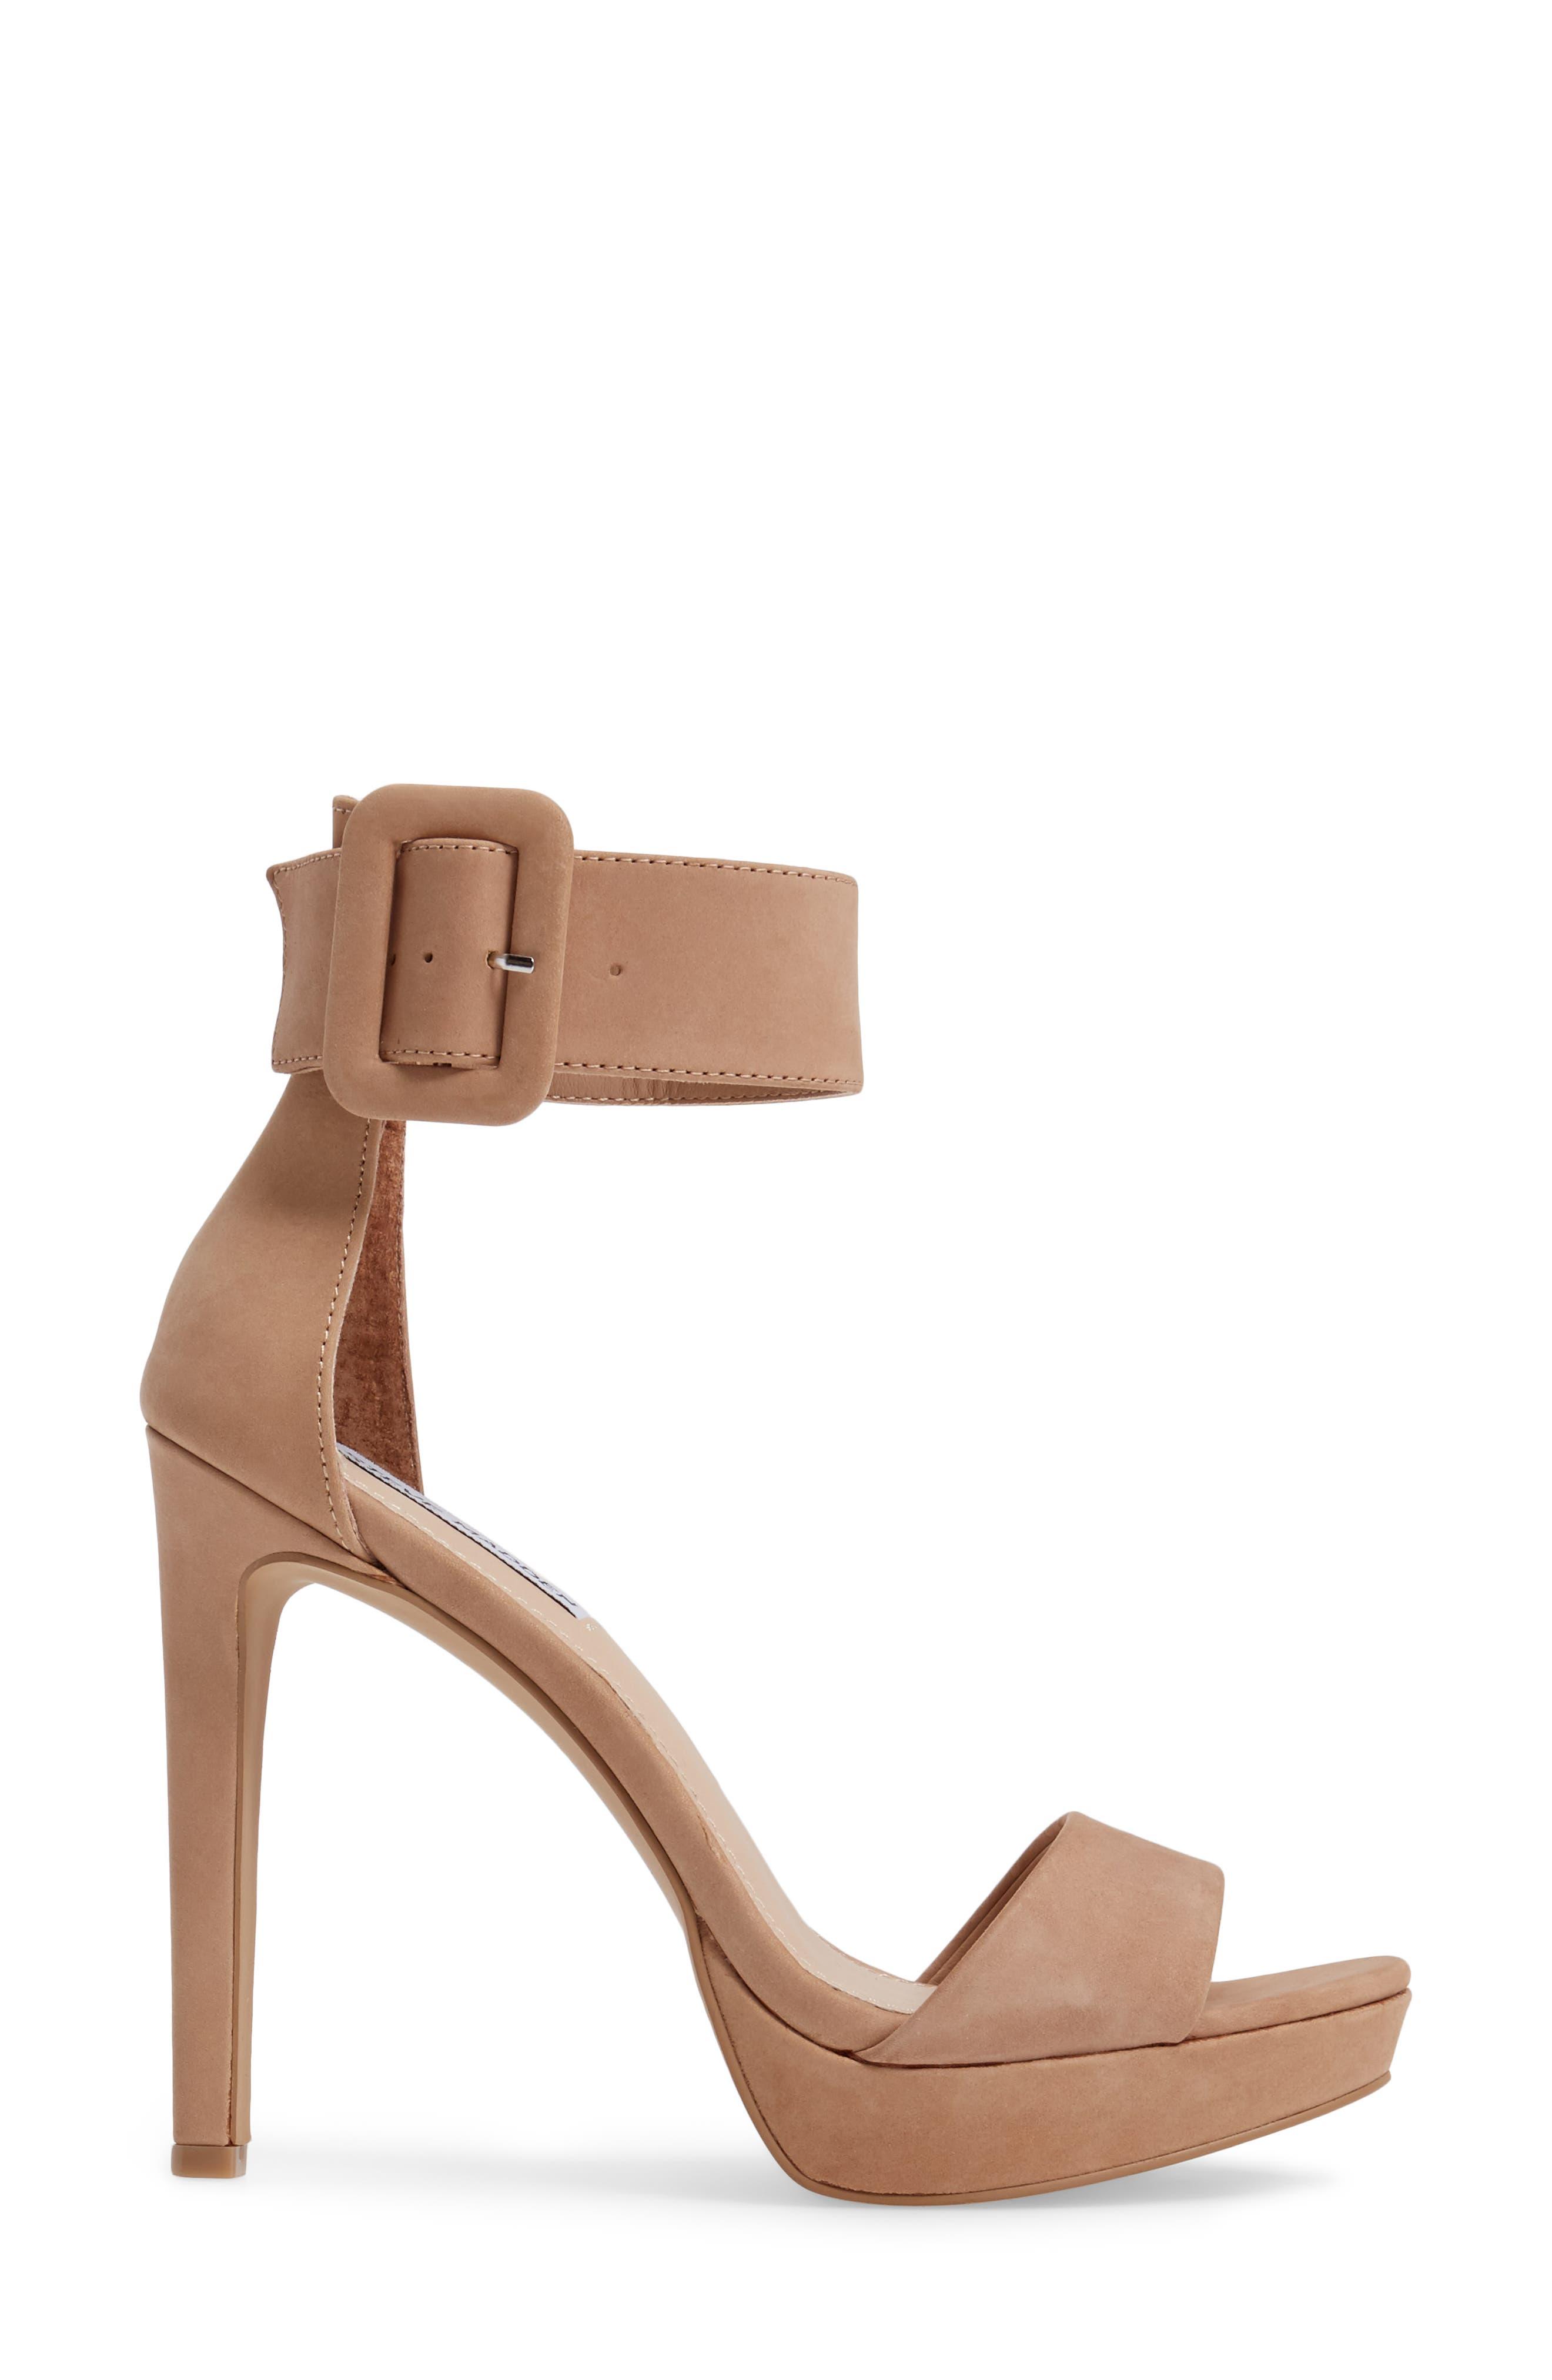 Circuit Sandal,                             Alternate thumbnail 3, color,                             Tan Nubuck Leather